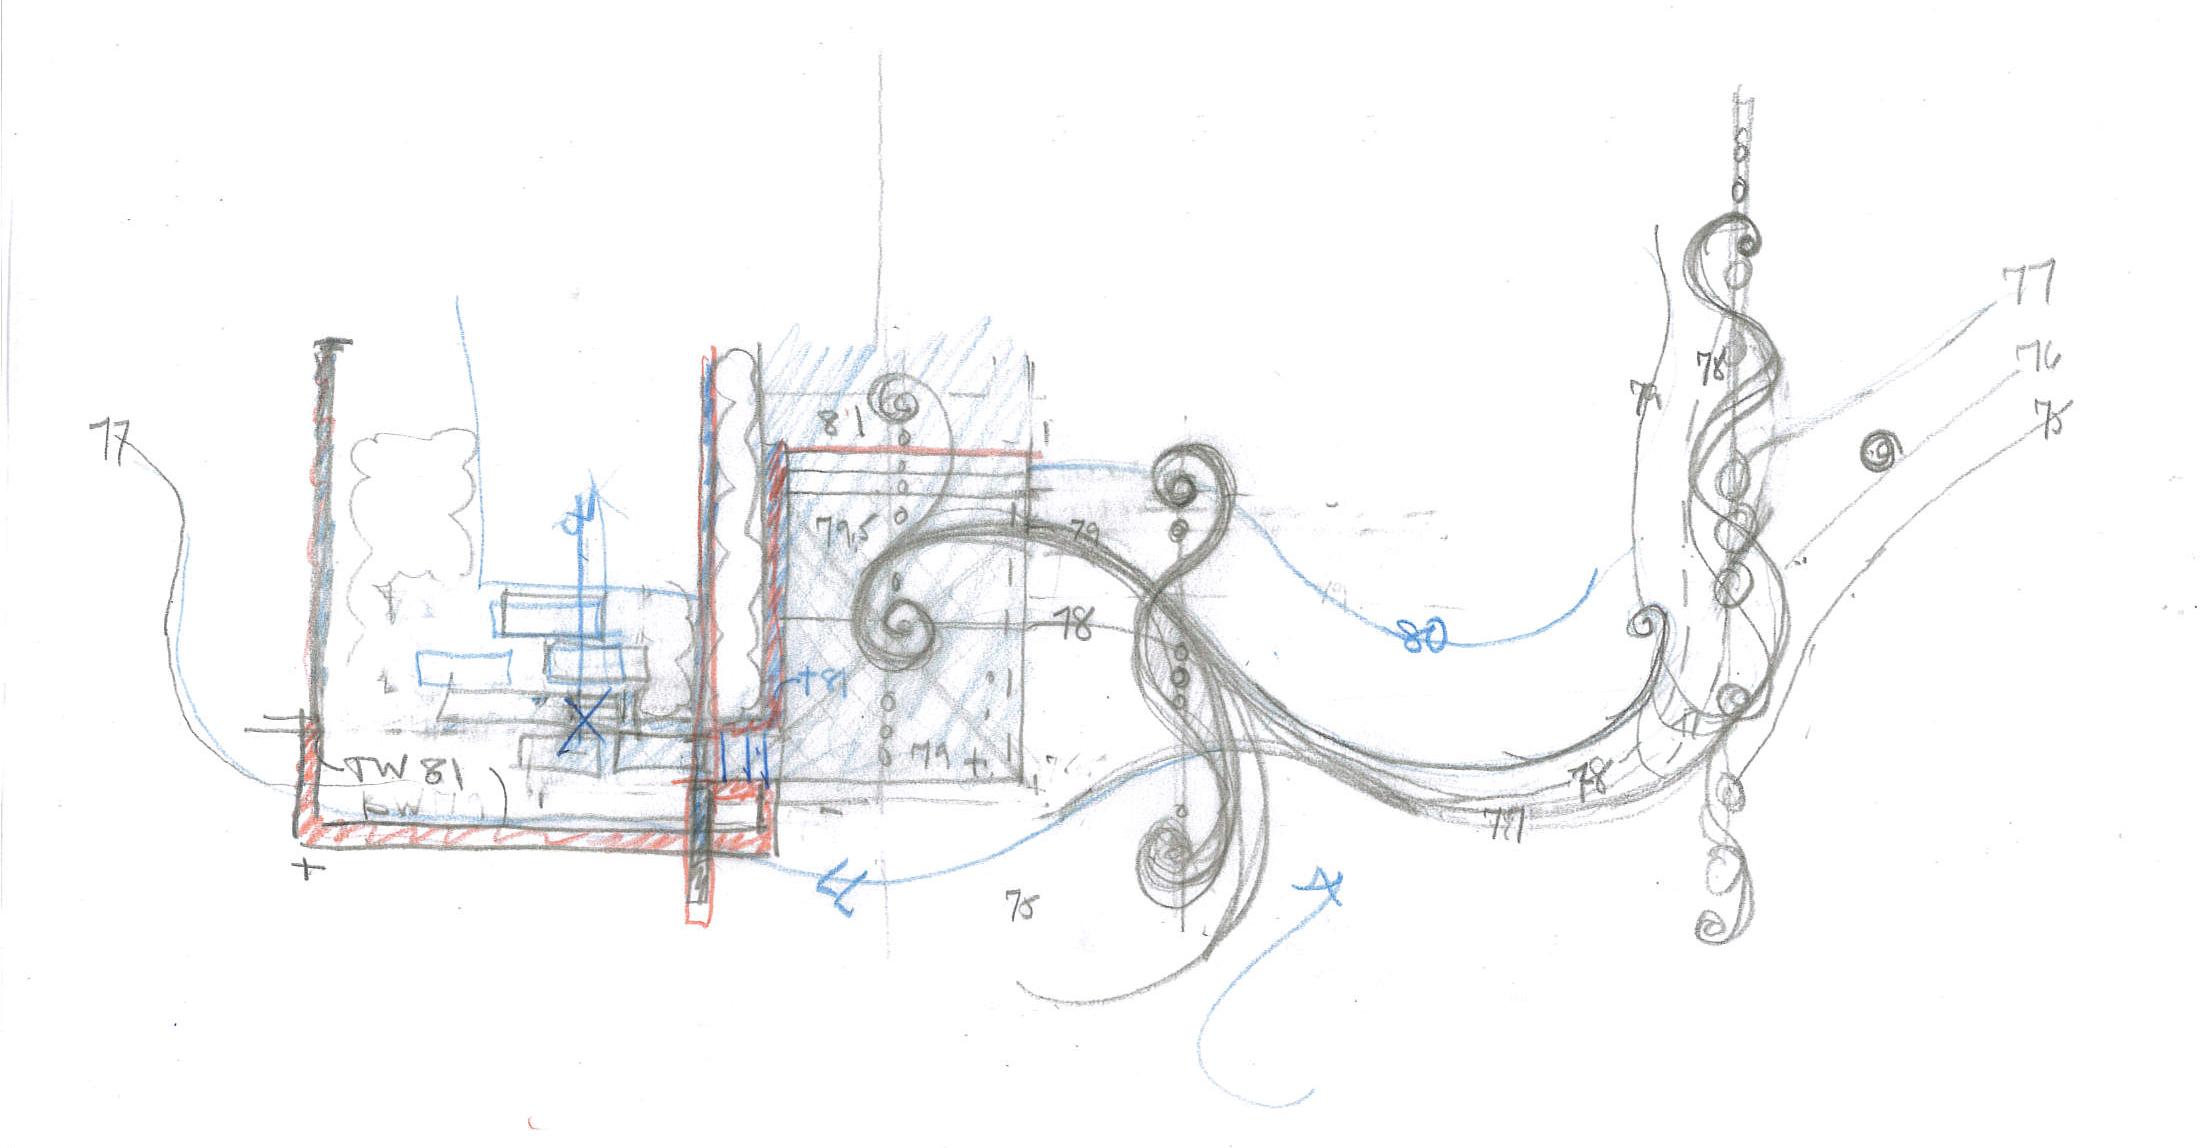 9dca6-spiral-vera-gates.jpg